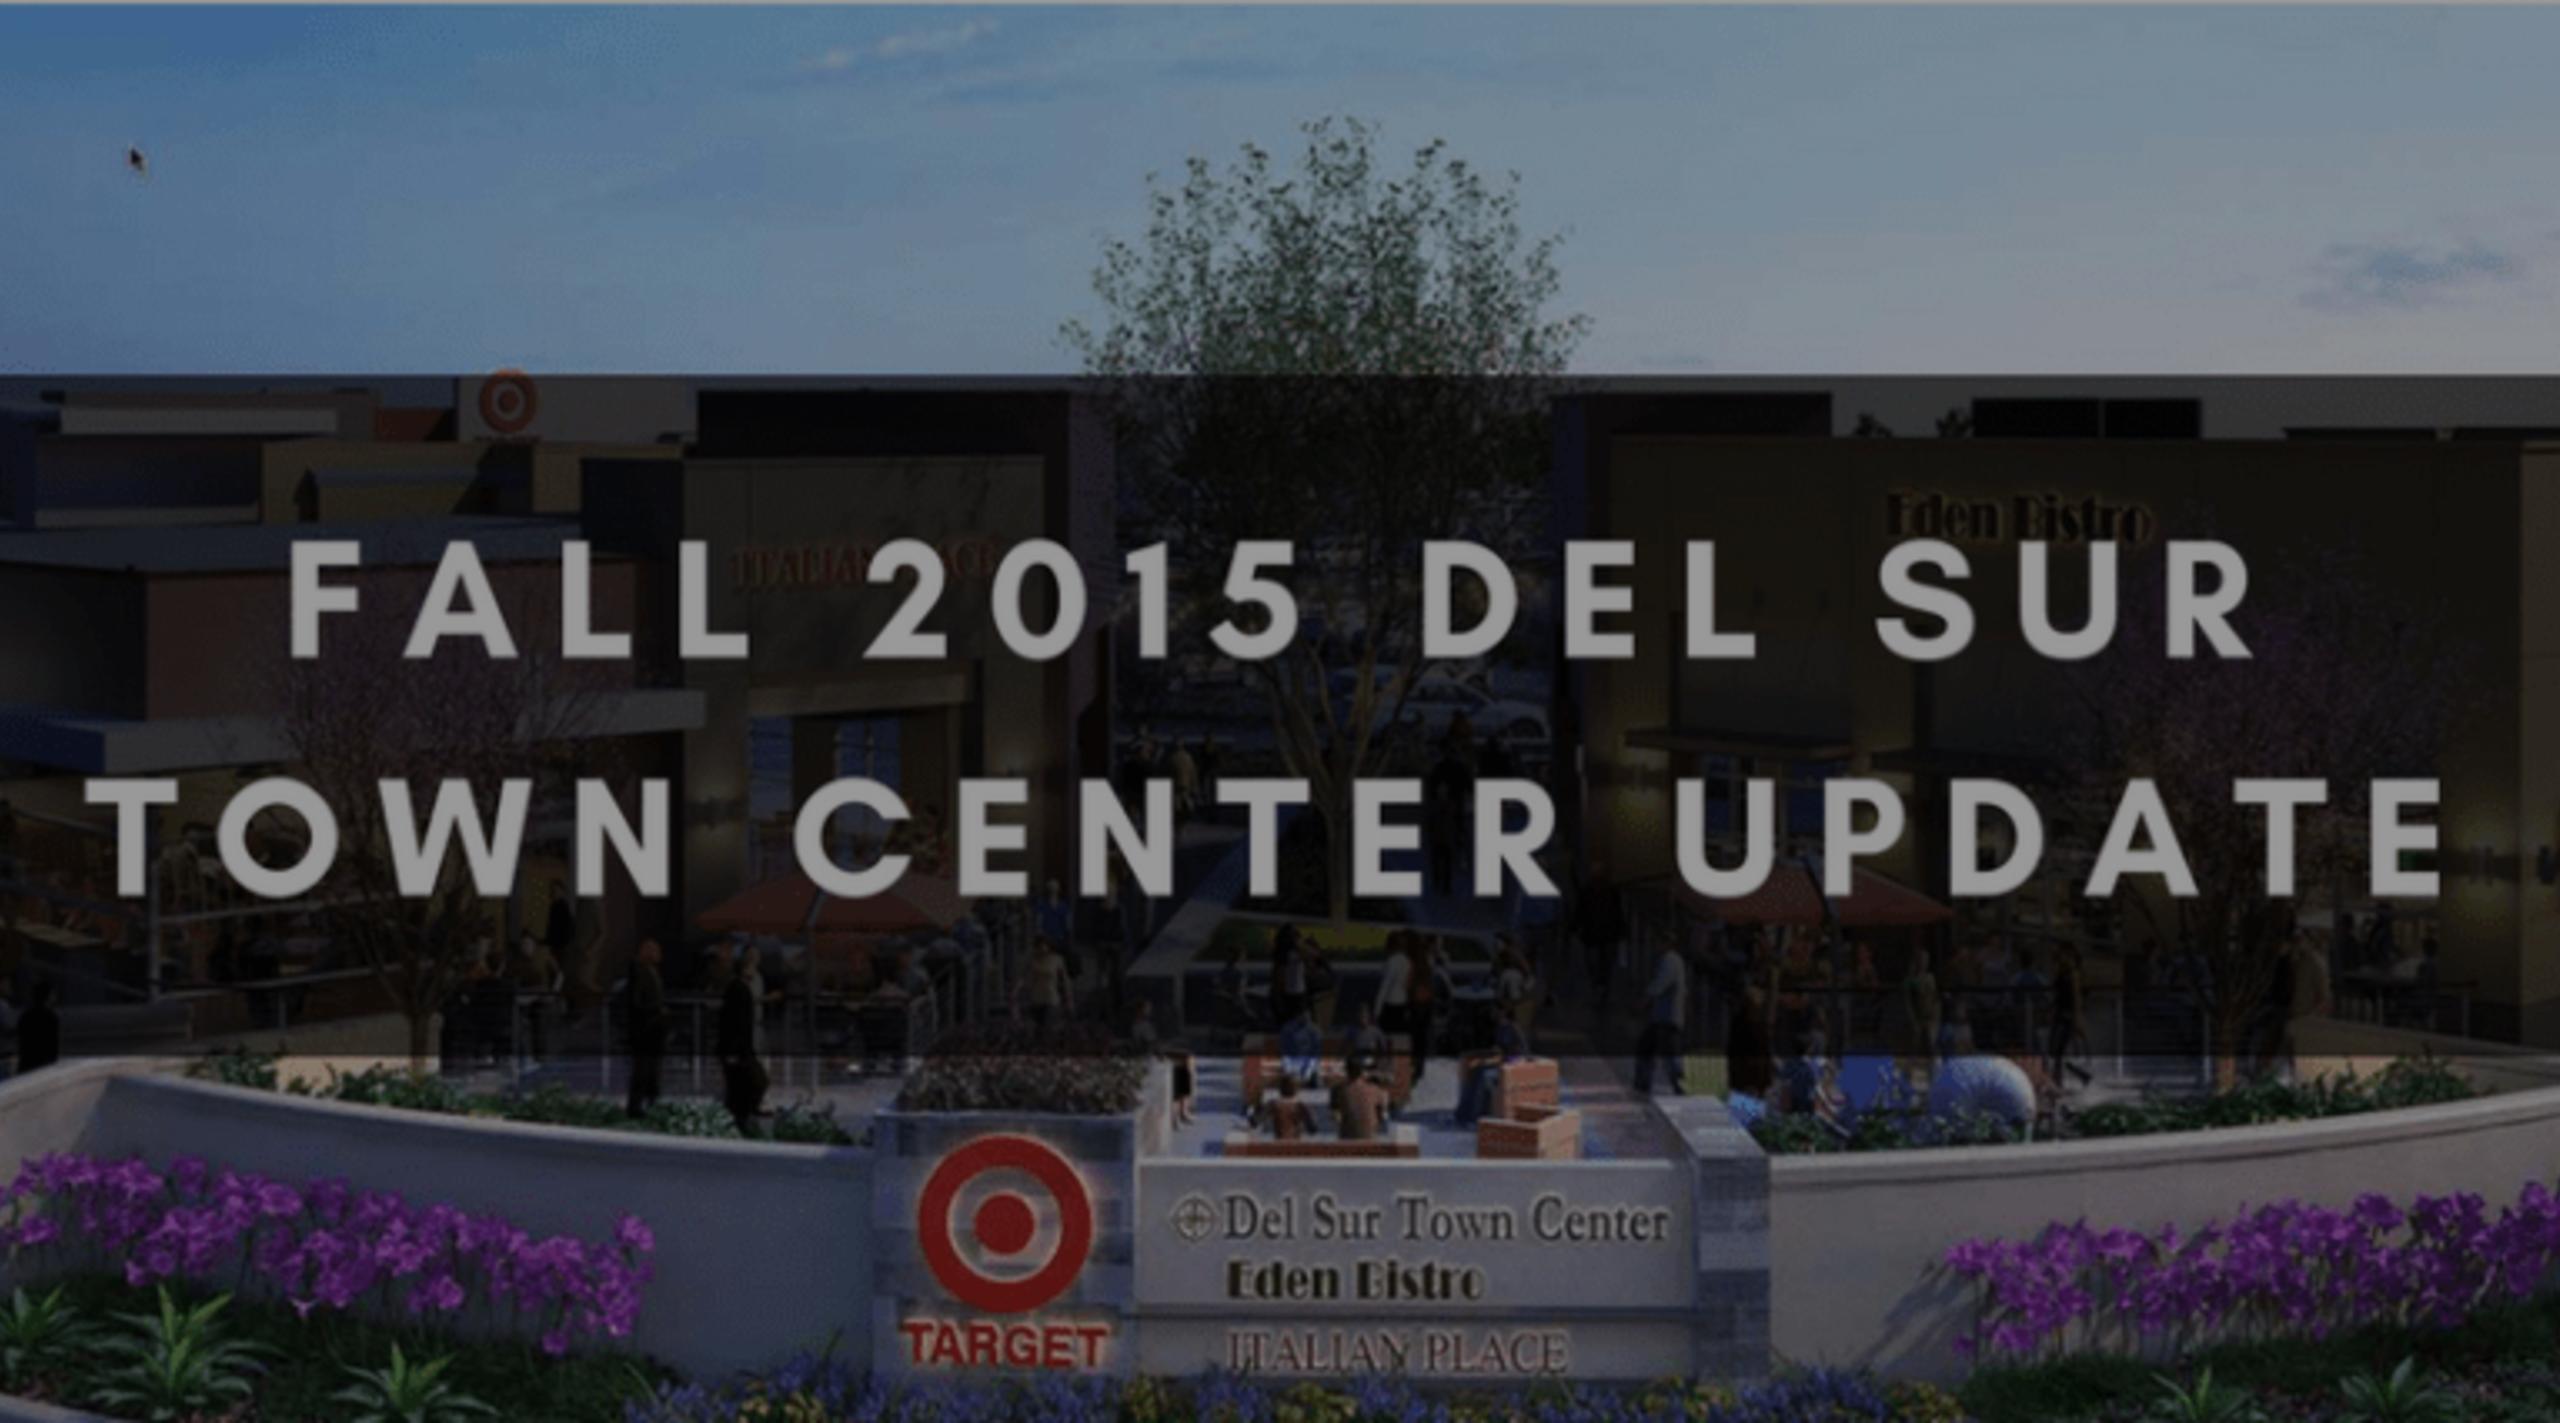 FALL 2015 DEL SUR TOWN CENTER UPDATE